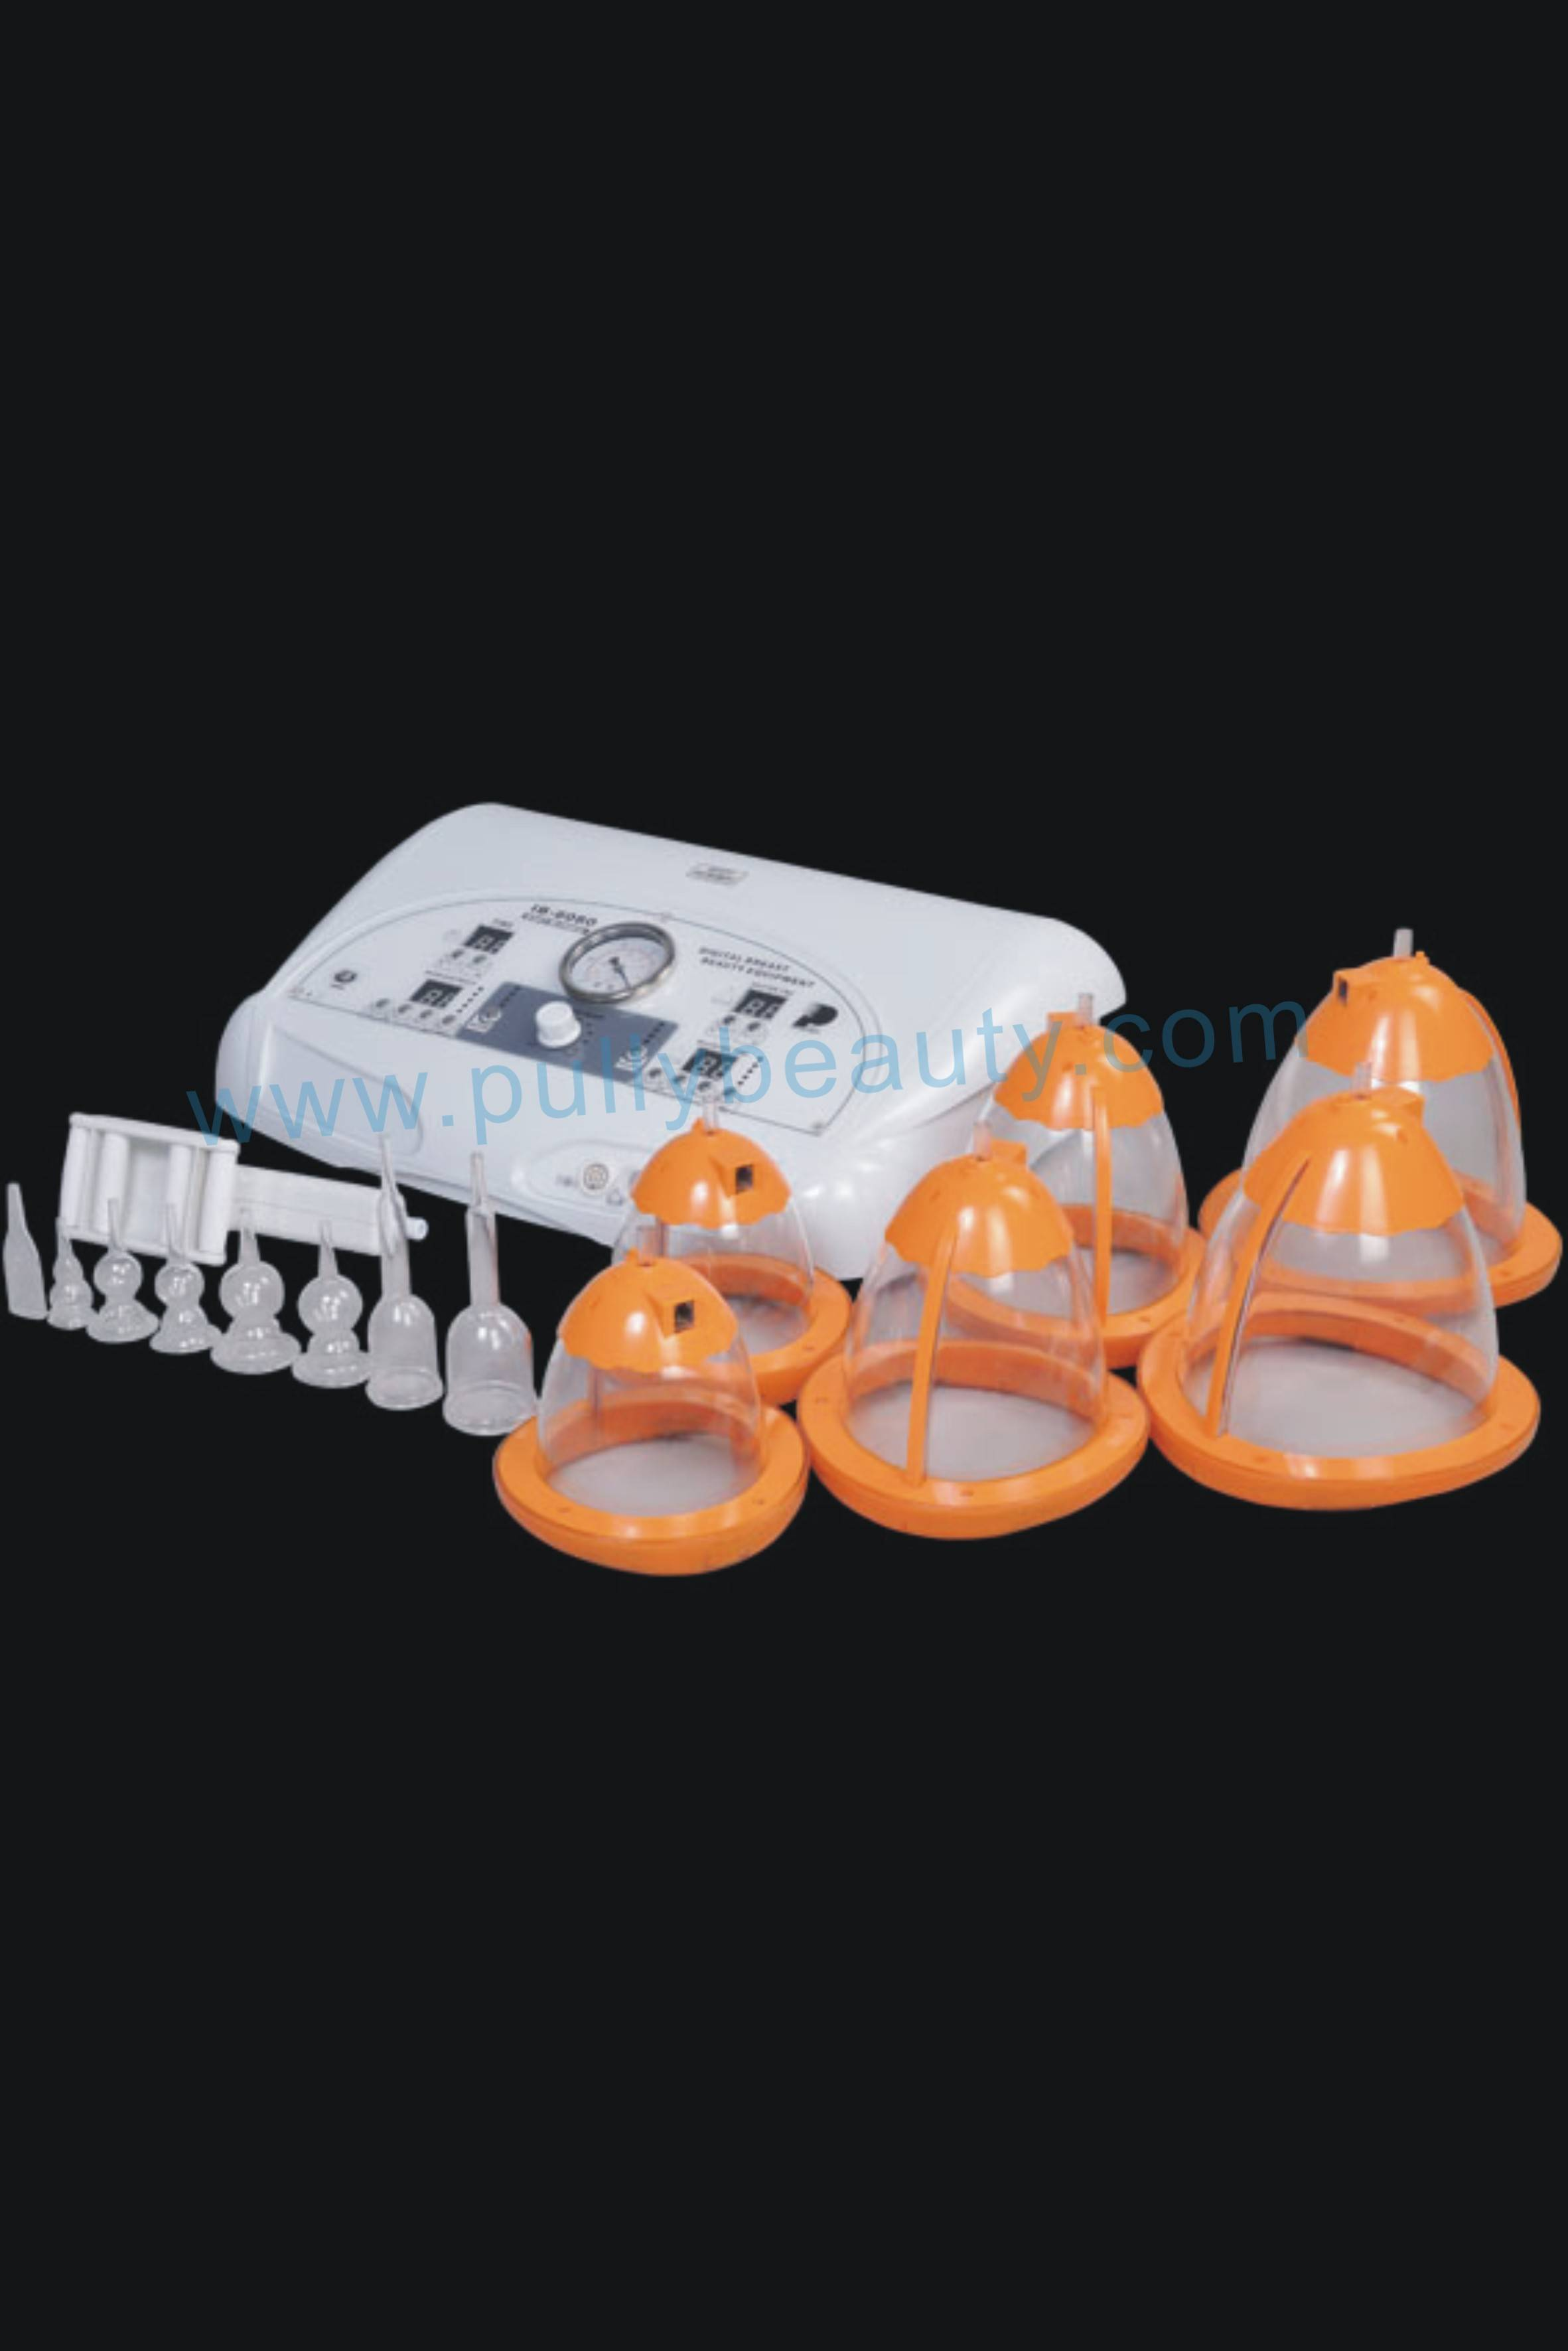 Digital Breast Beauty Equipment